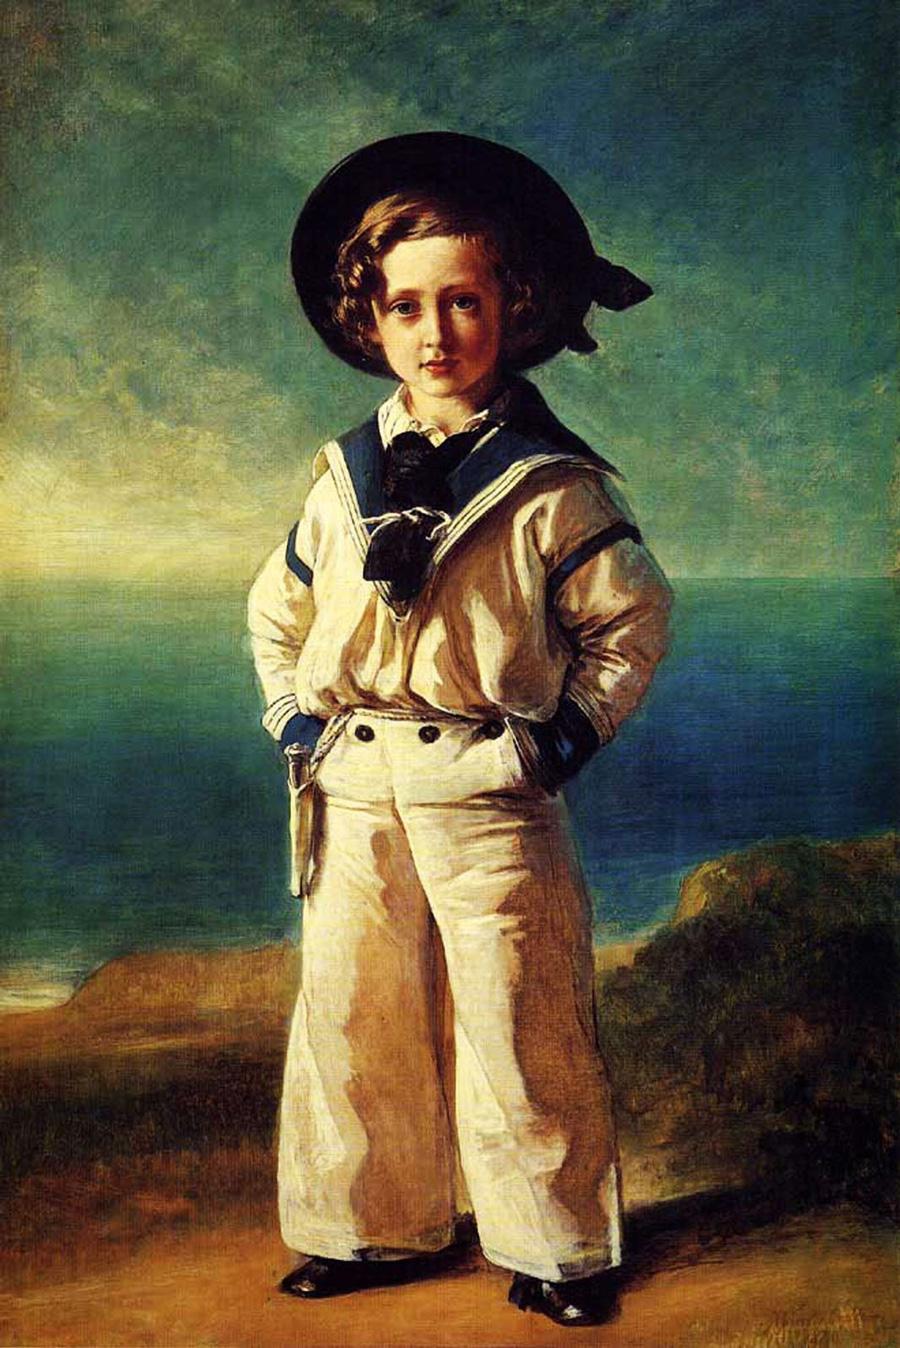 charm-patterns-nautical-fashion-history1